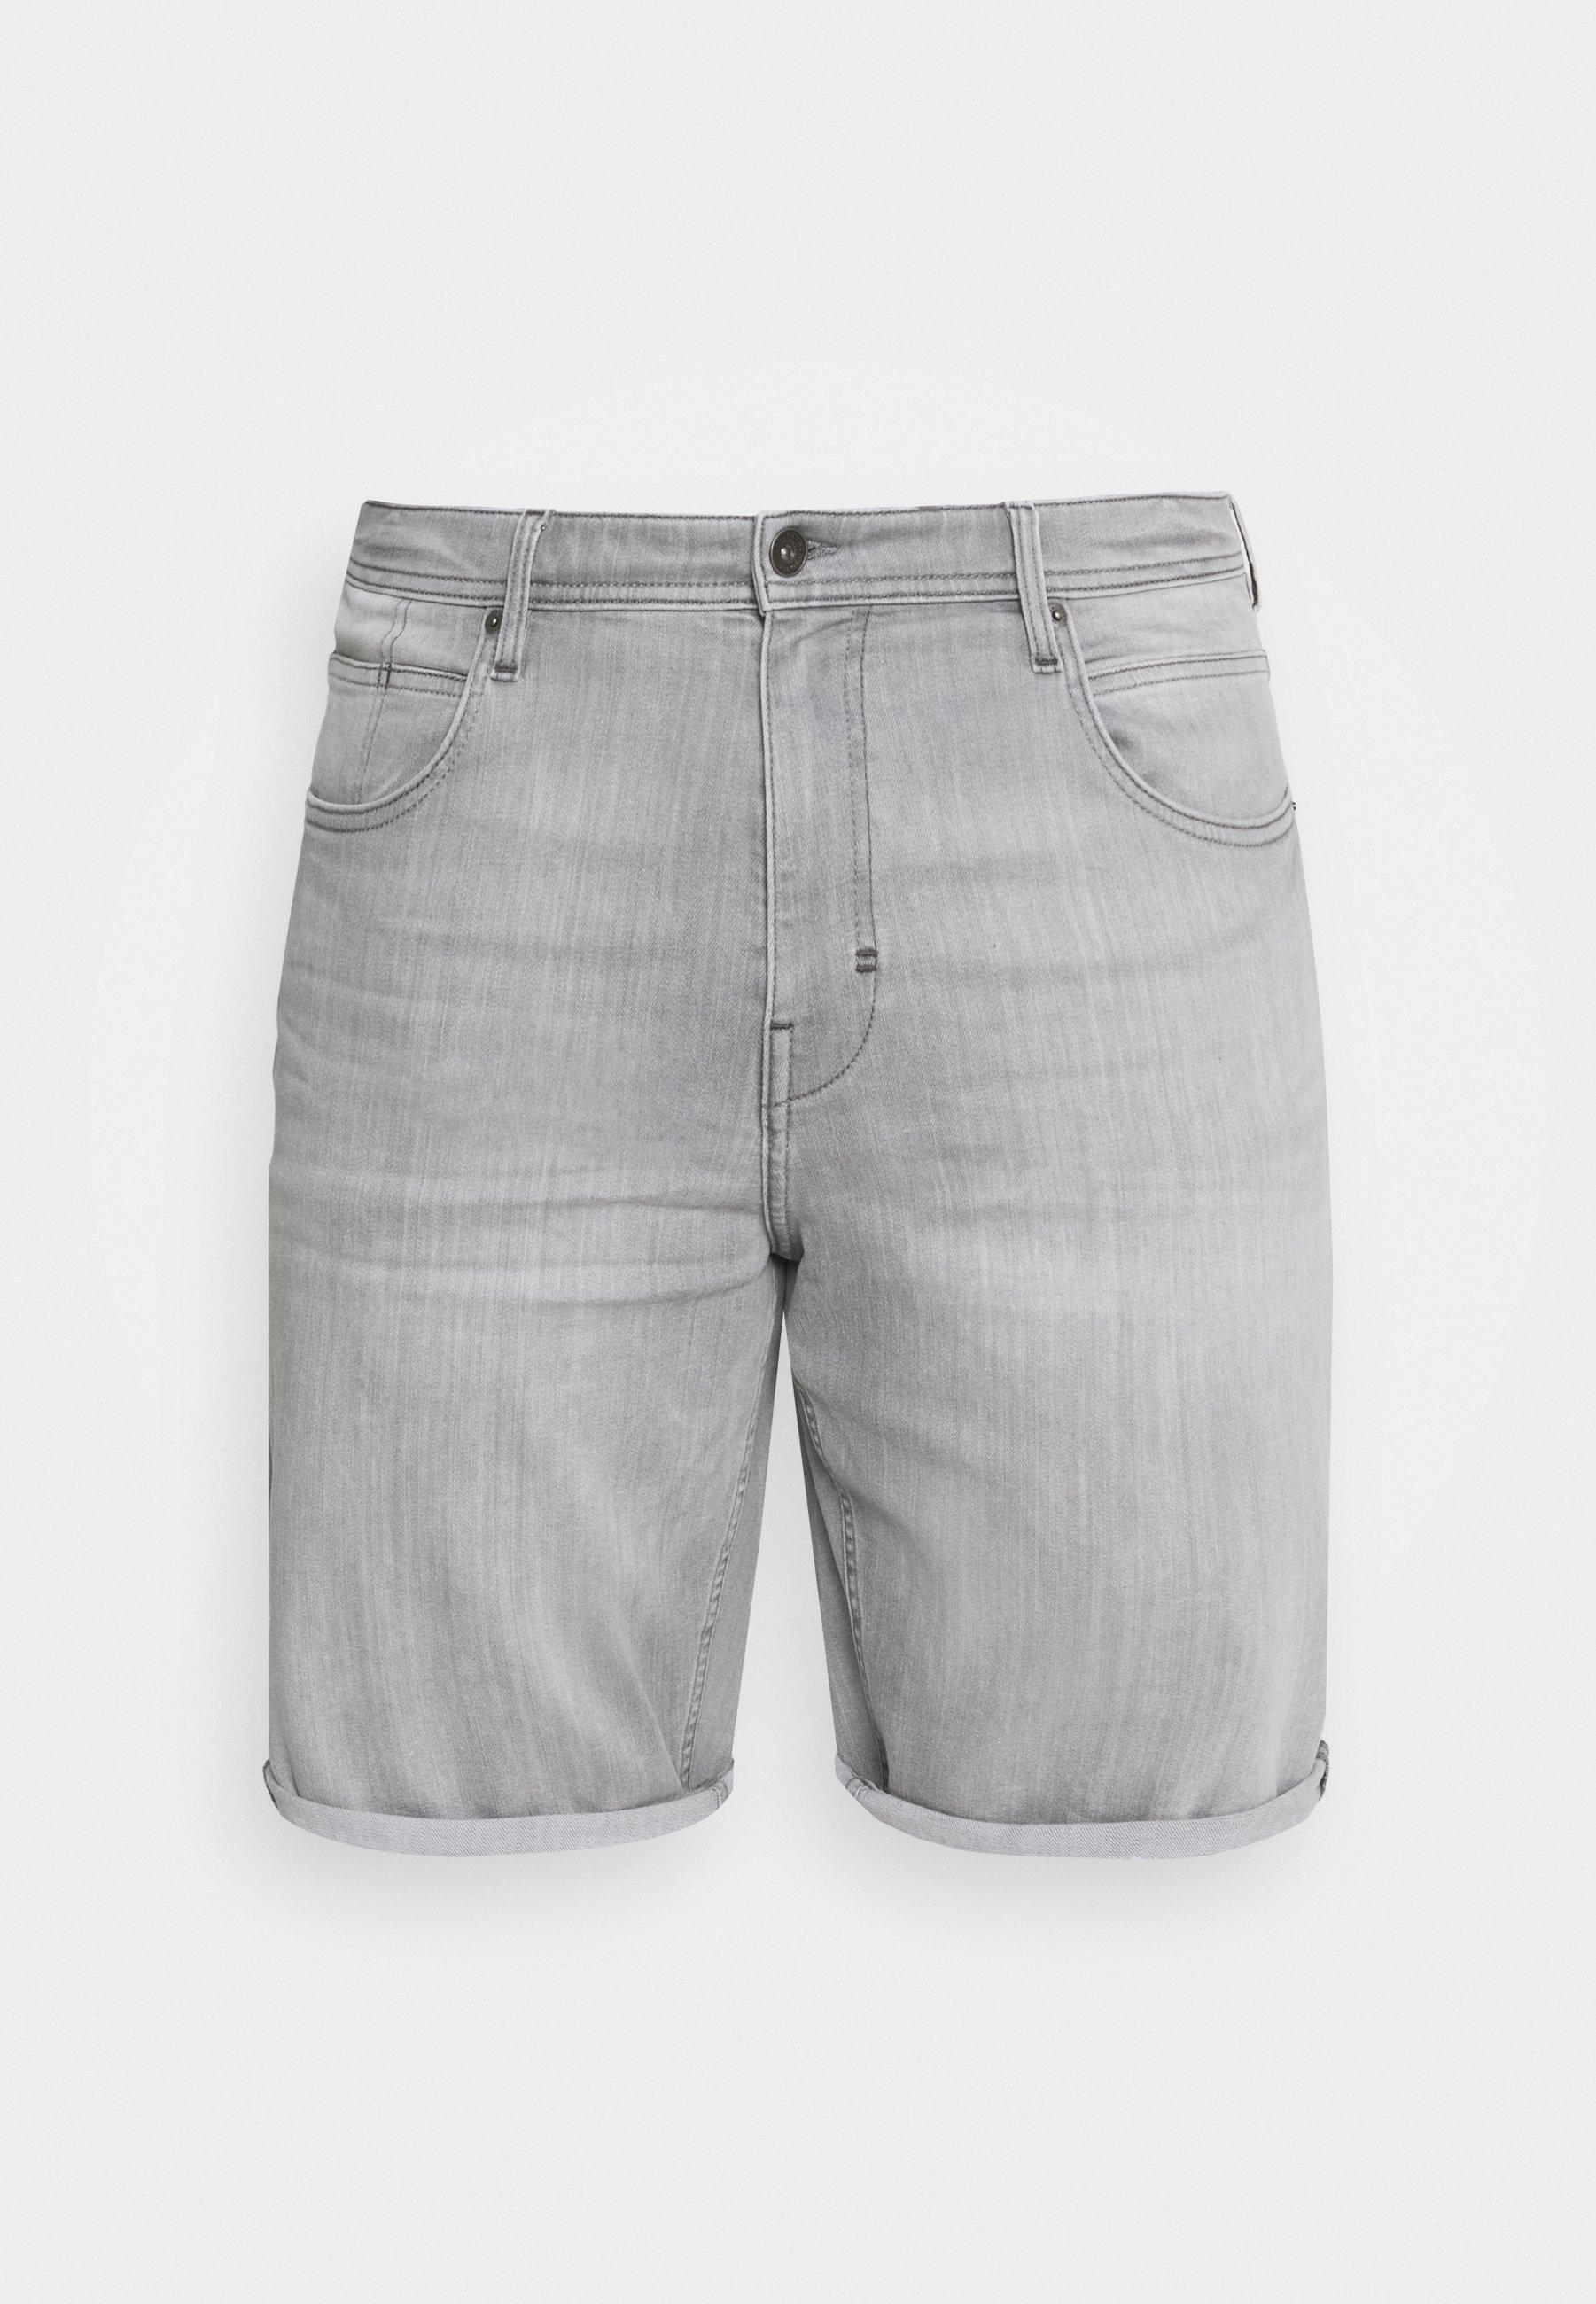 Esprit Jeans Shorts - Grey Light Wash